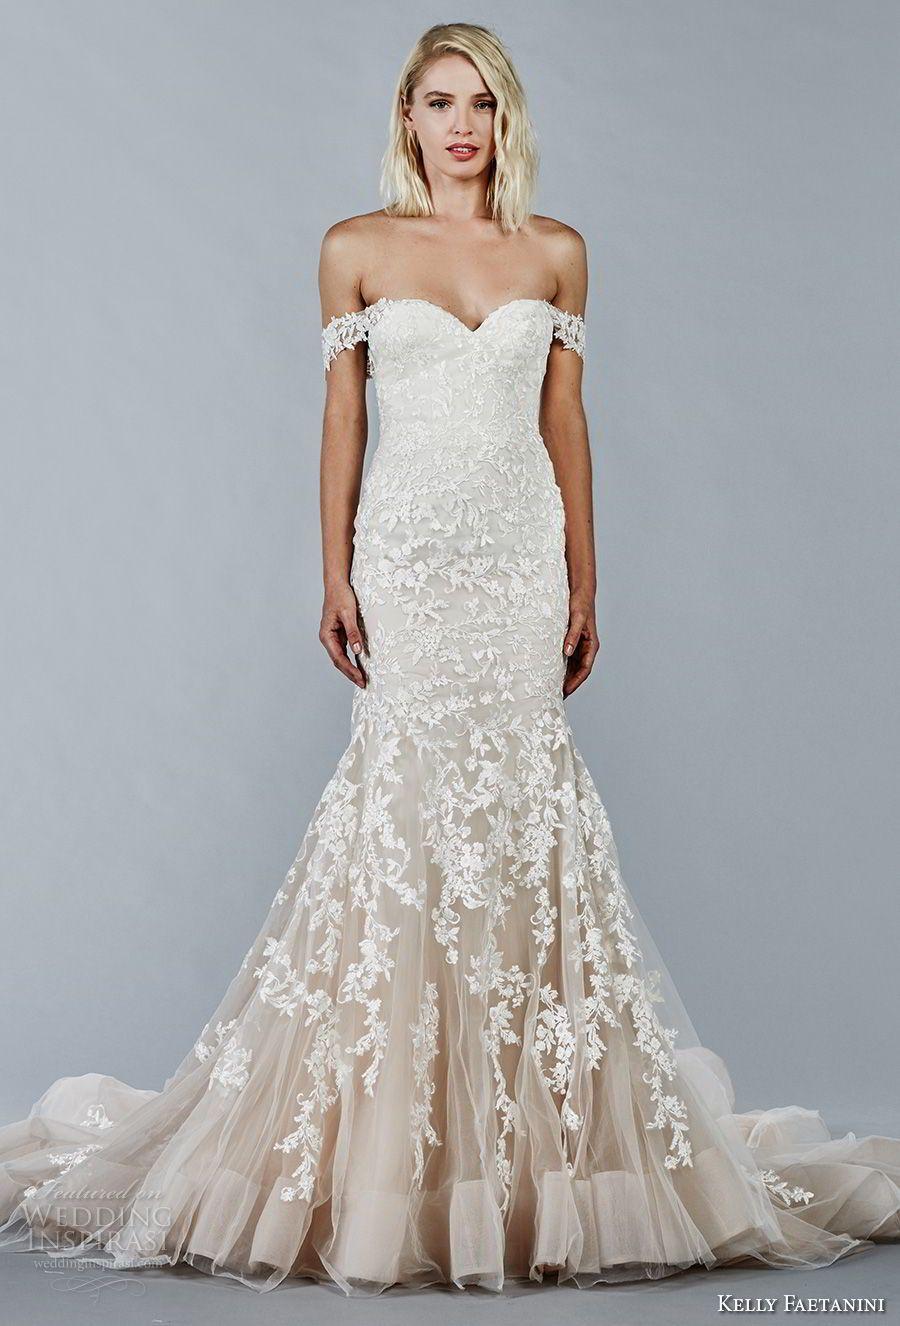 Kelly Faetanini Fall 2018 Wedding Dresses | Mermaid wedding dresses ...